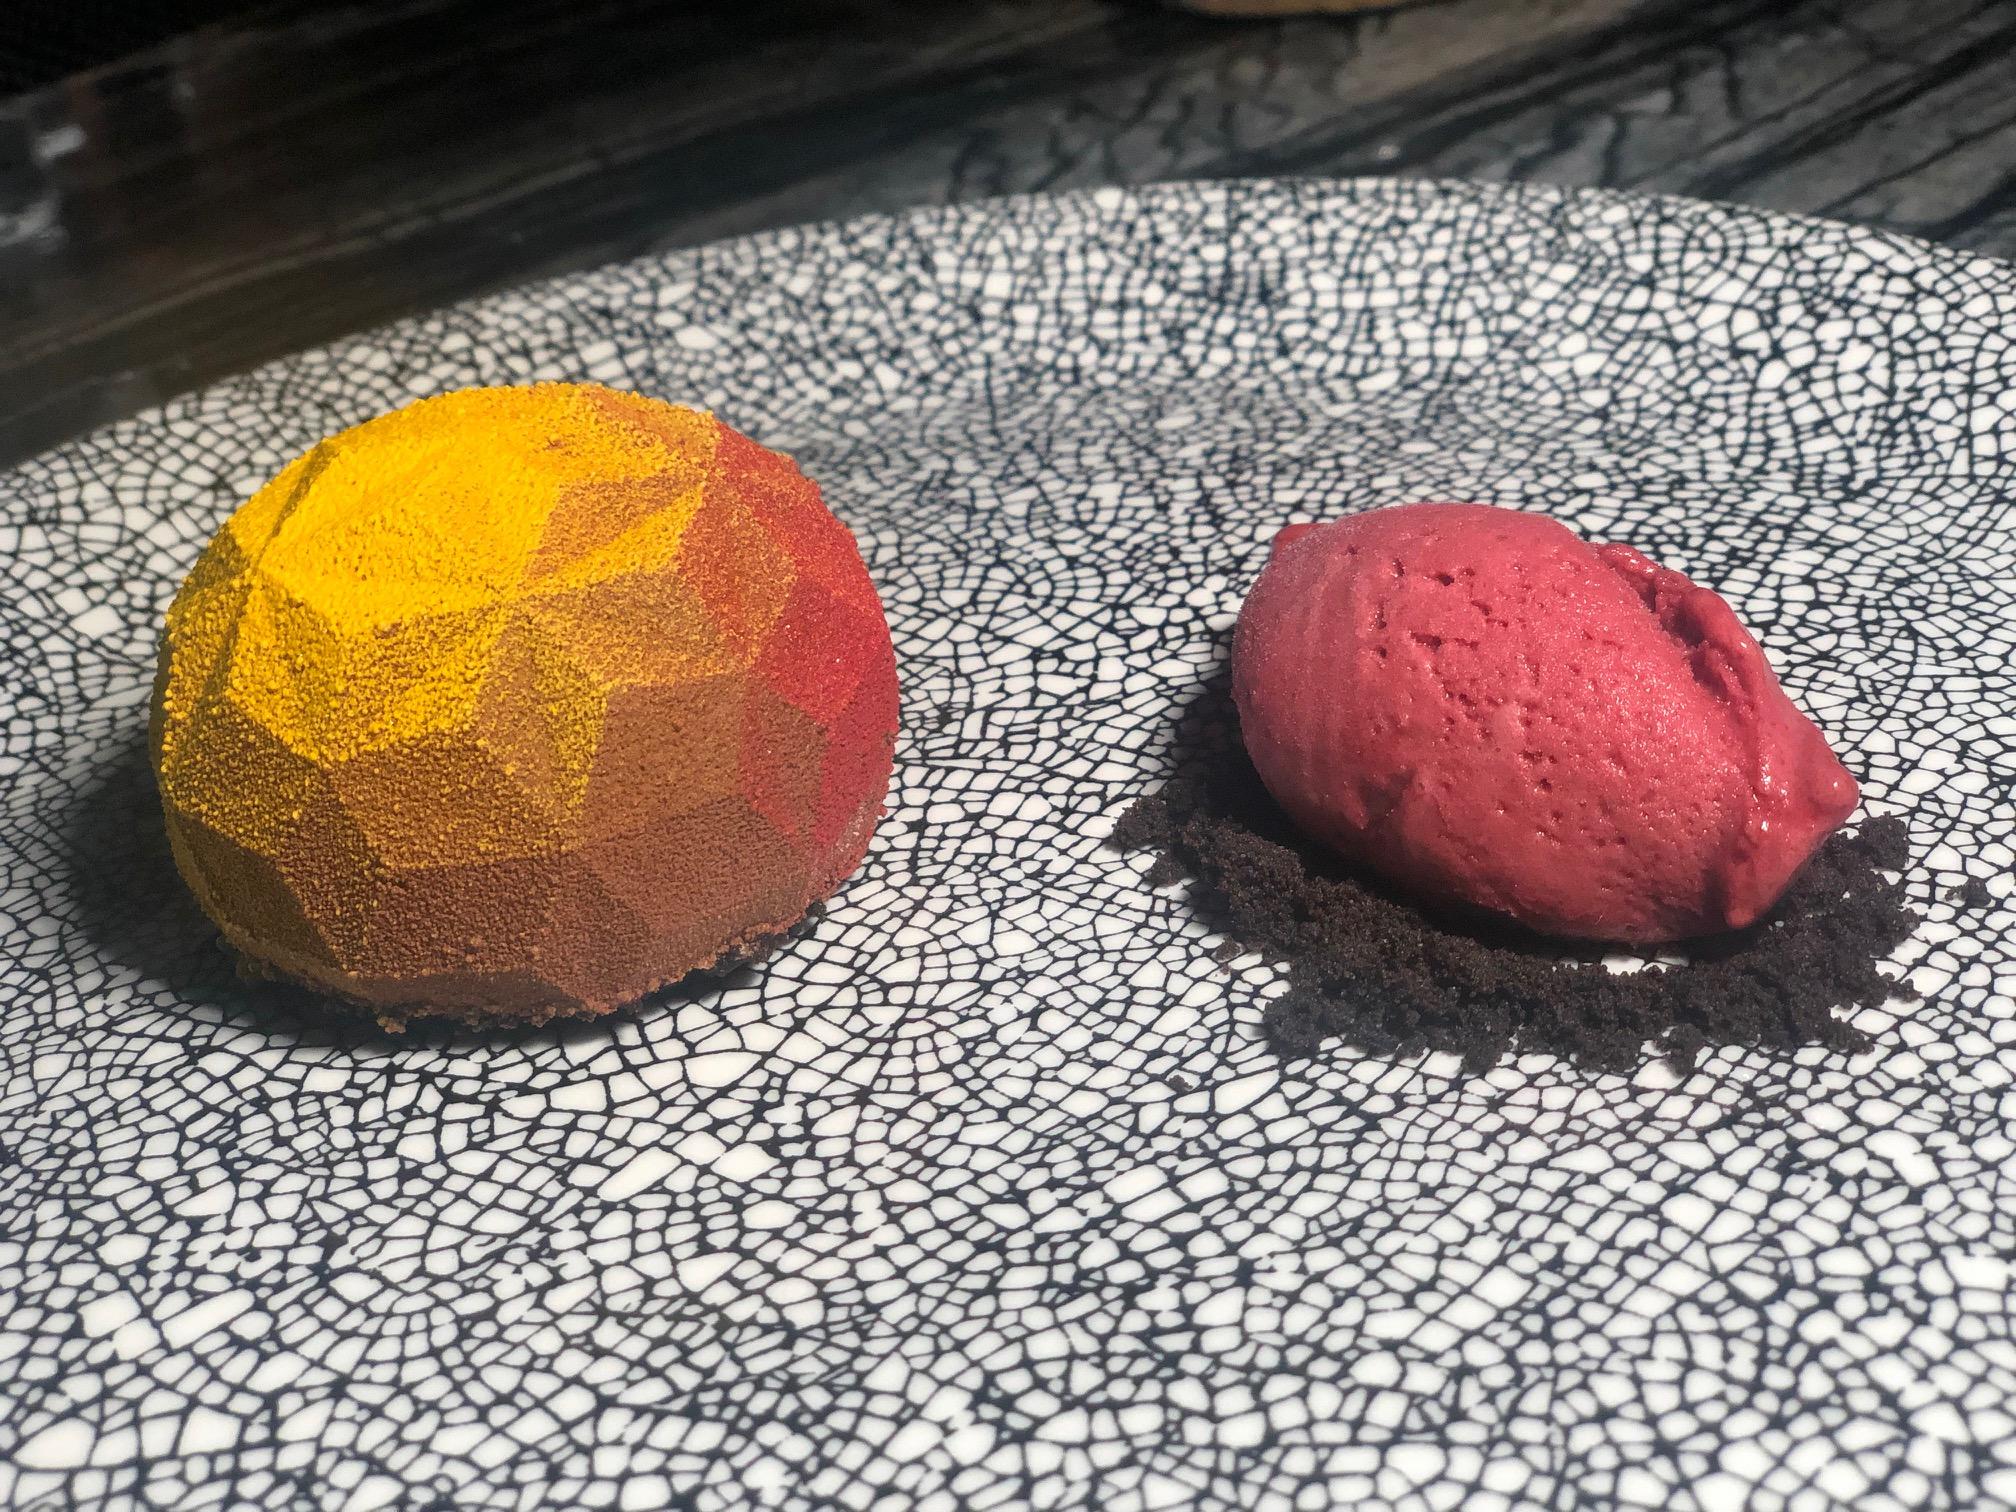 dessert at kaido.jpg